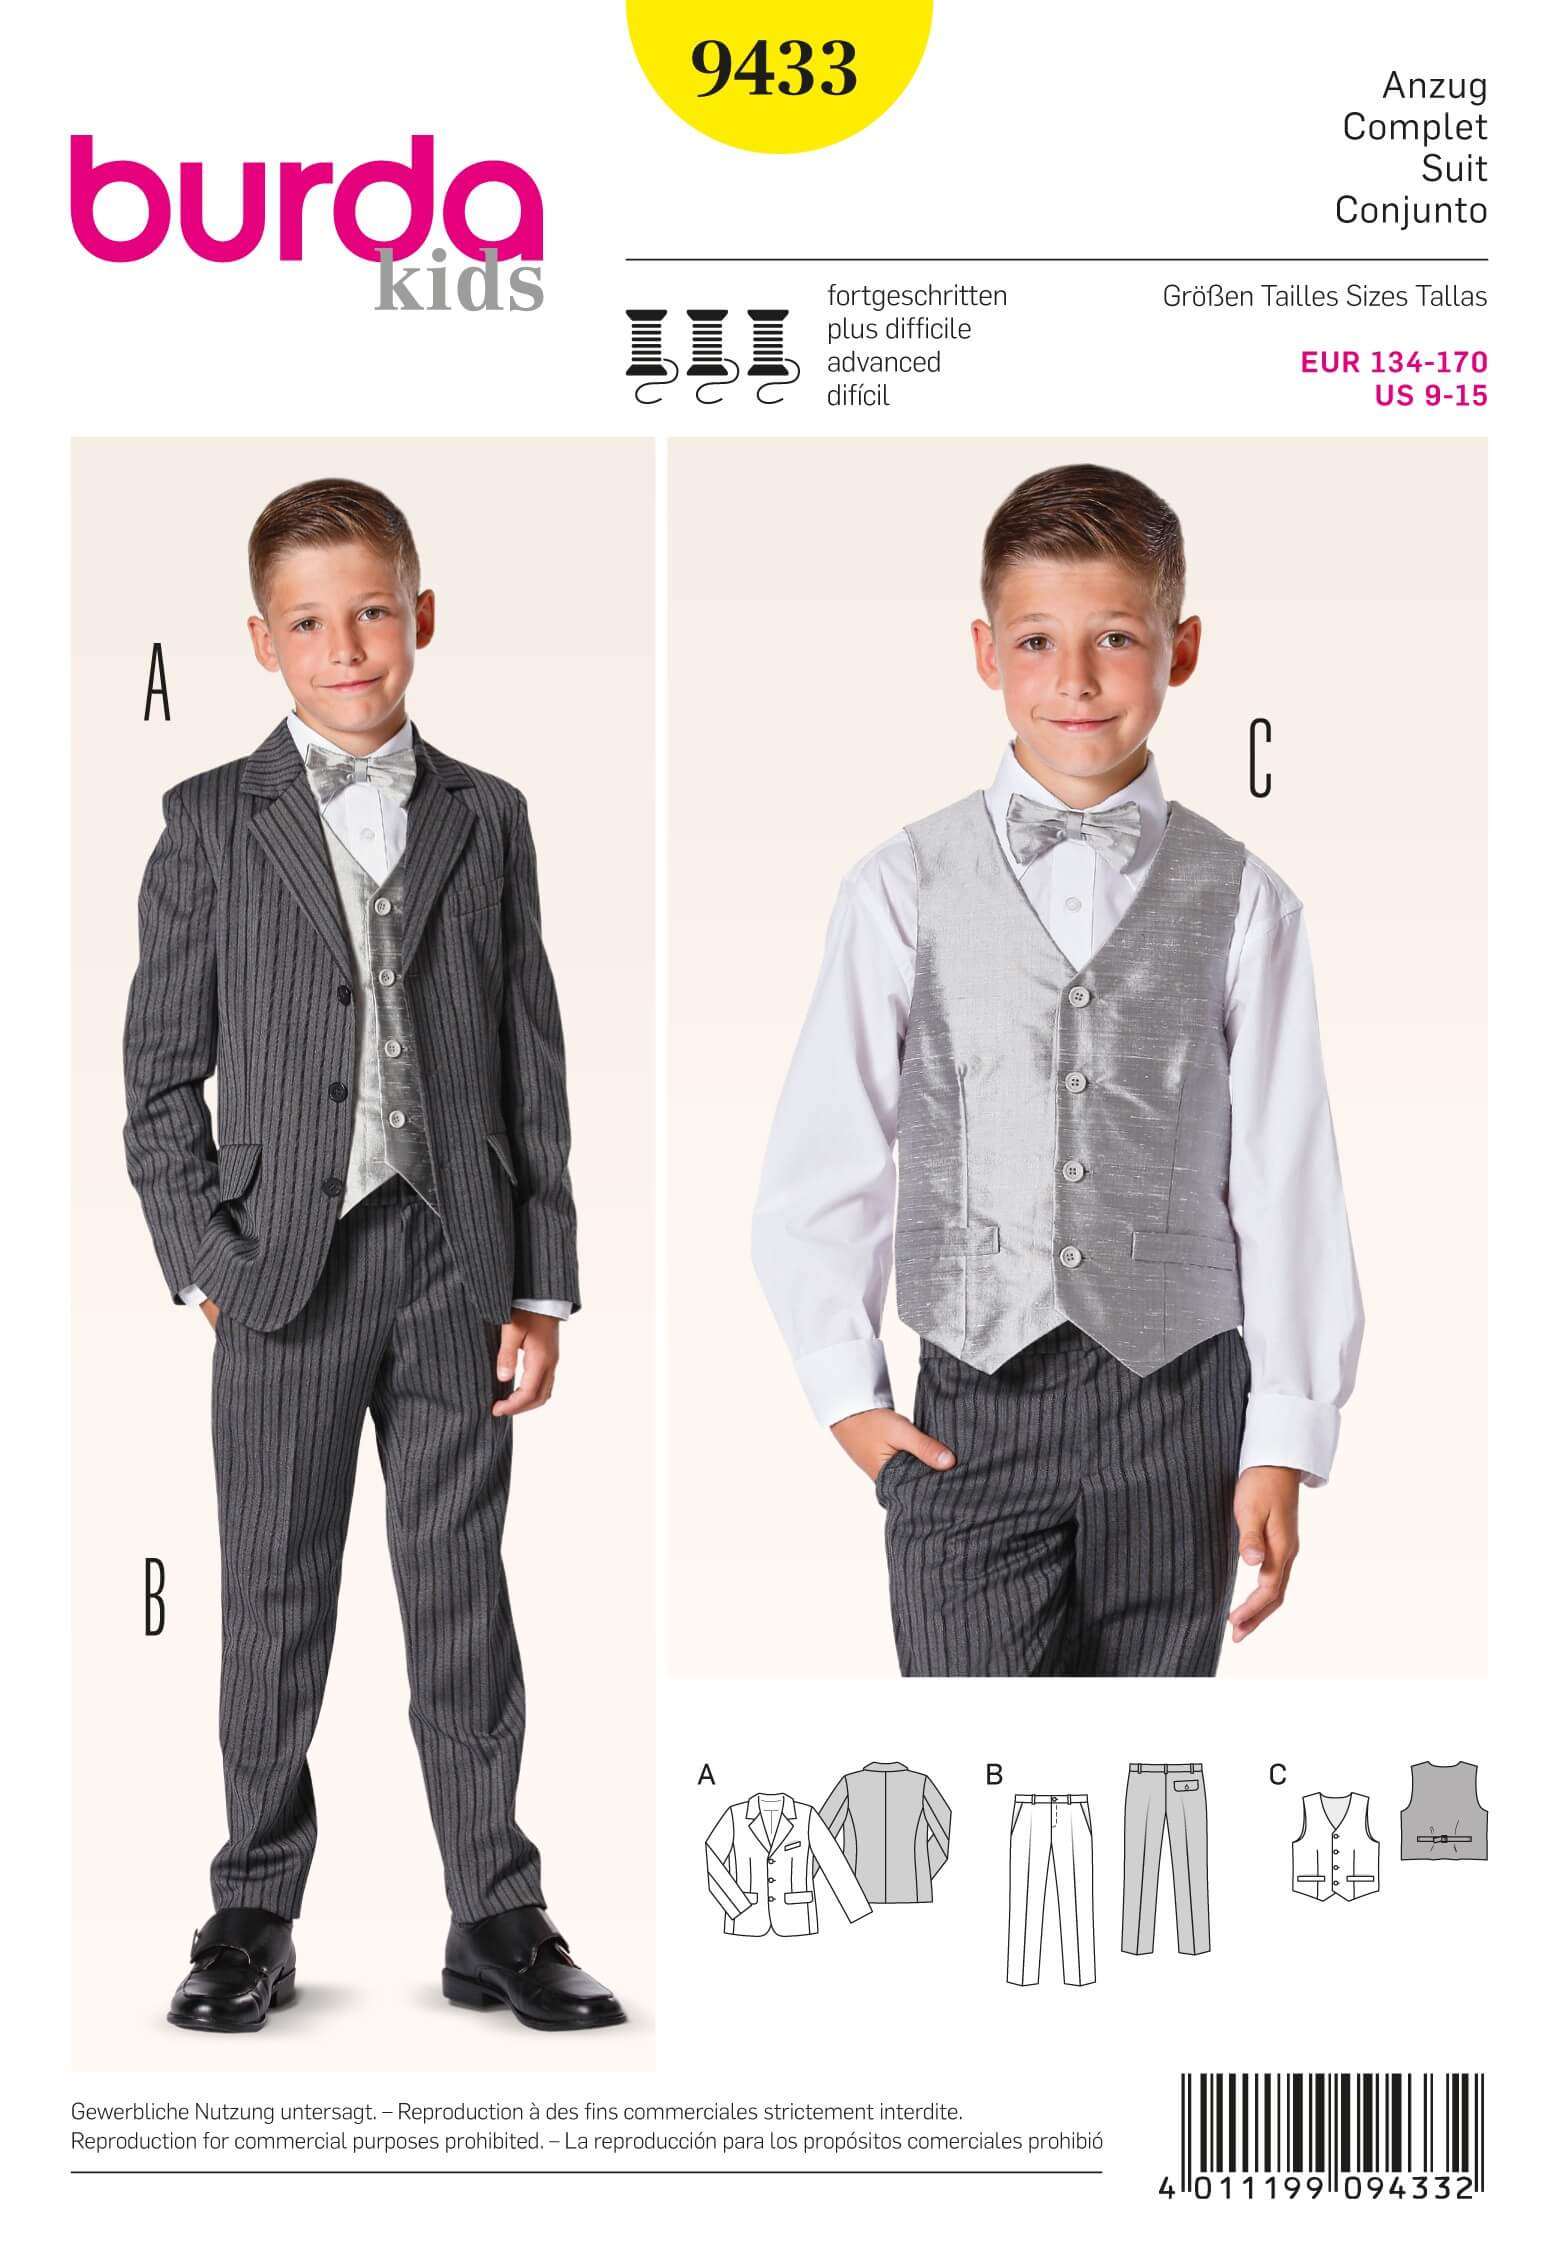 Burda Kids Boys Evening Wear Suit Fabric Sewing Pattern 9433